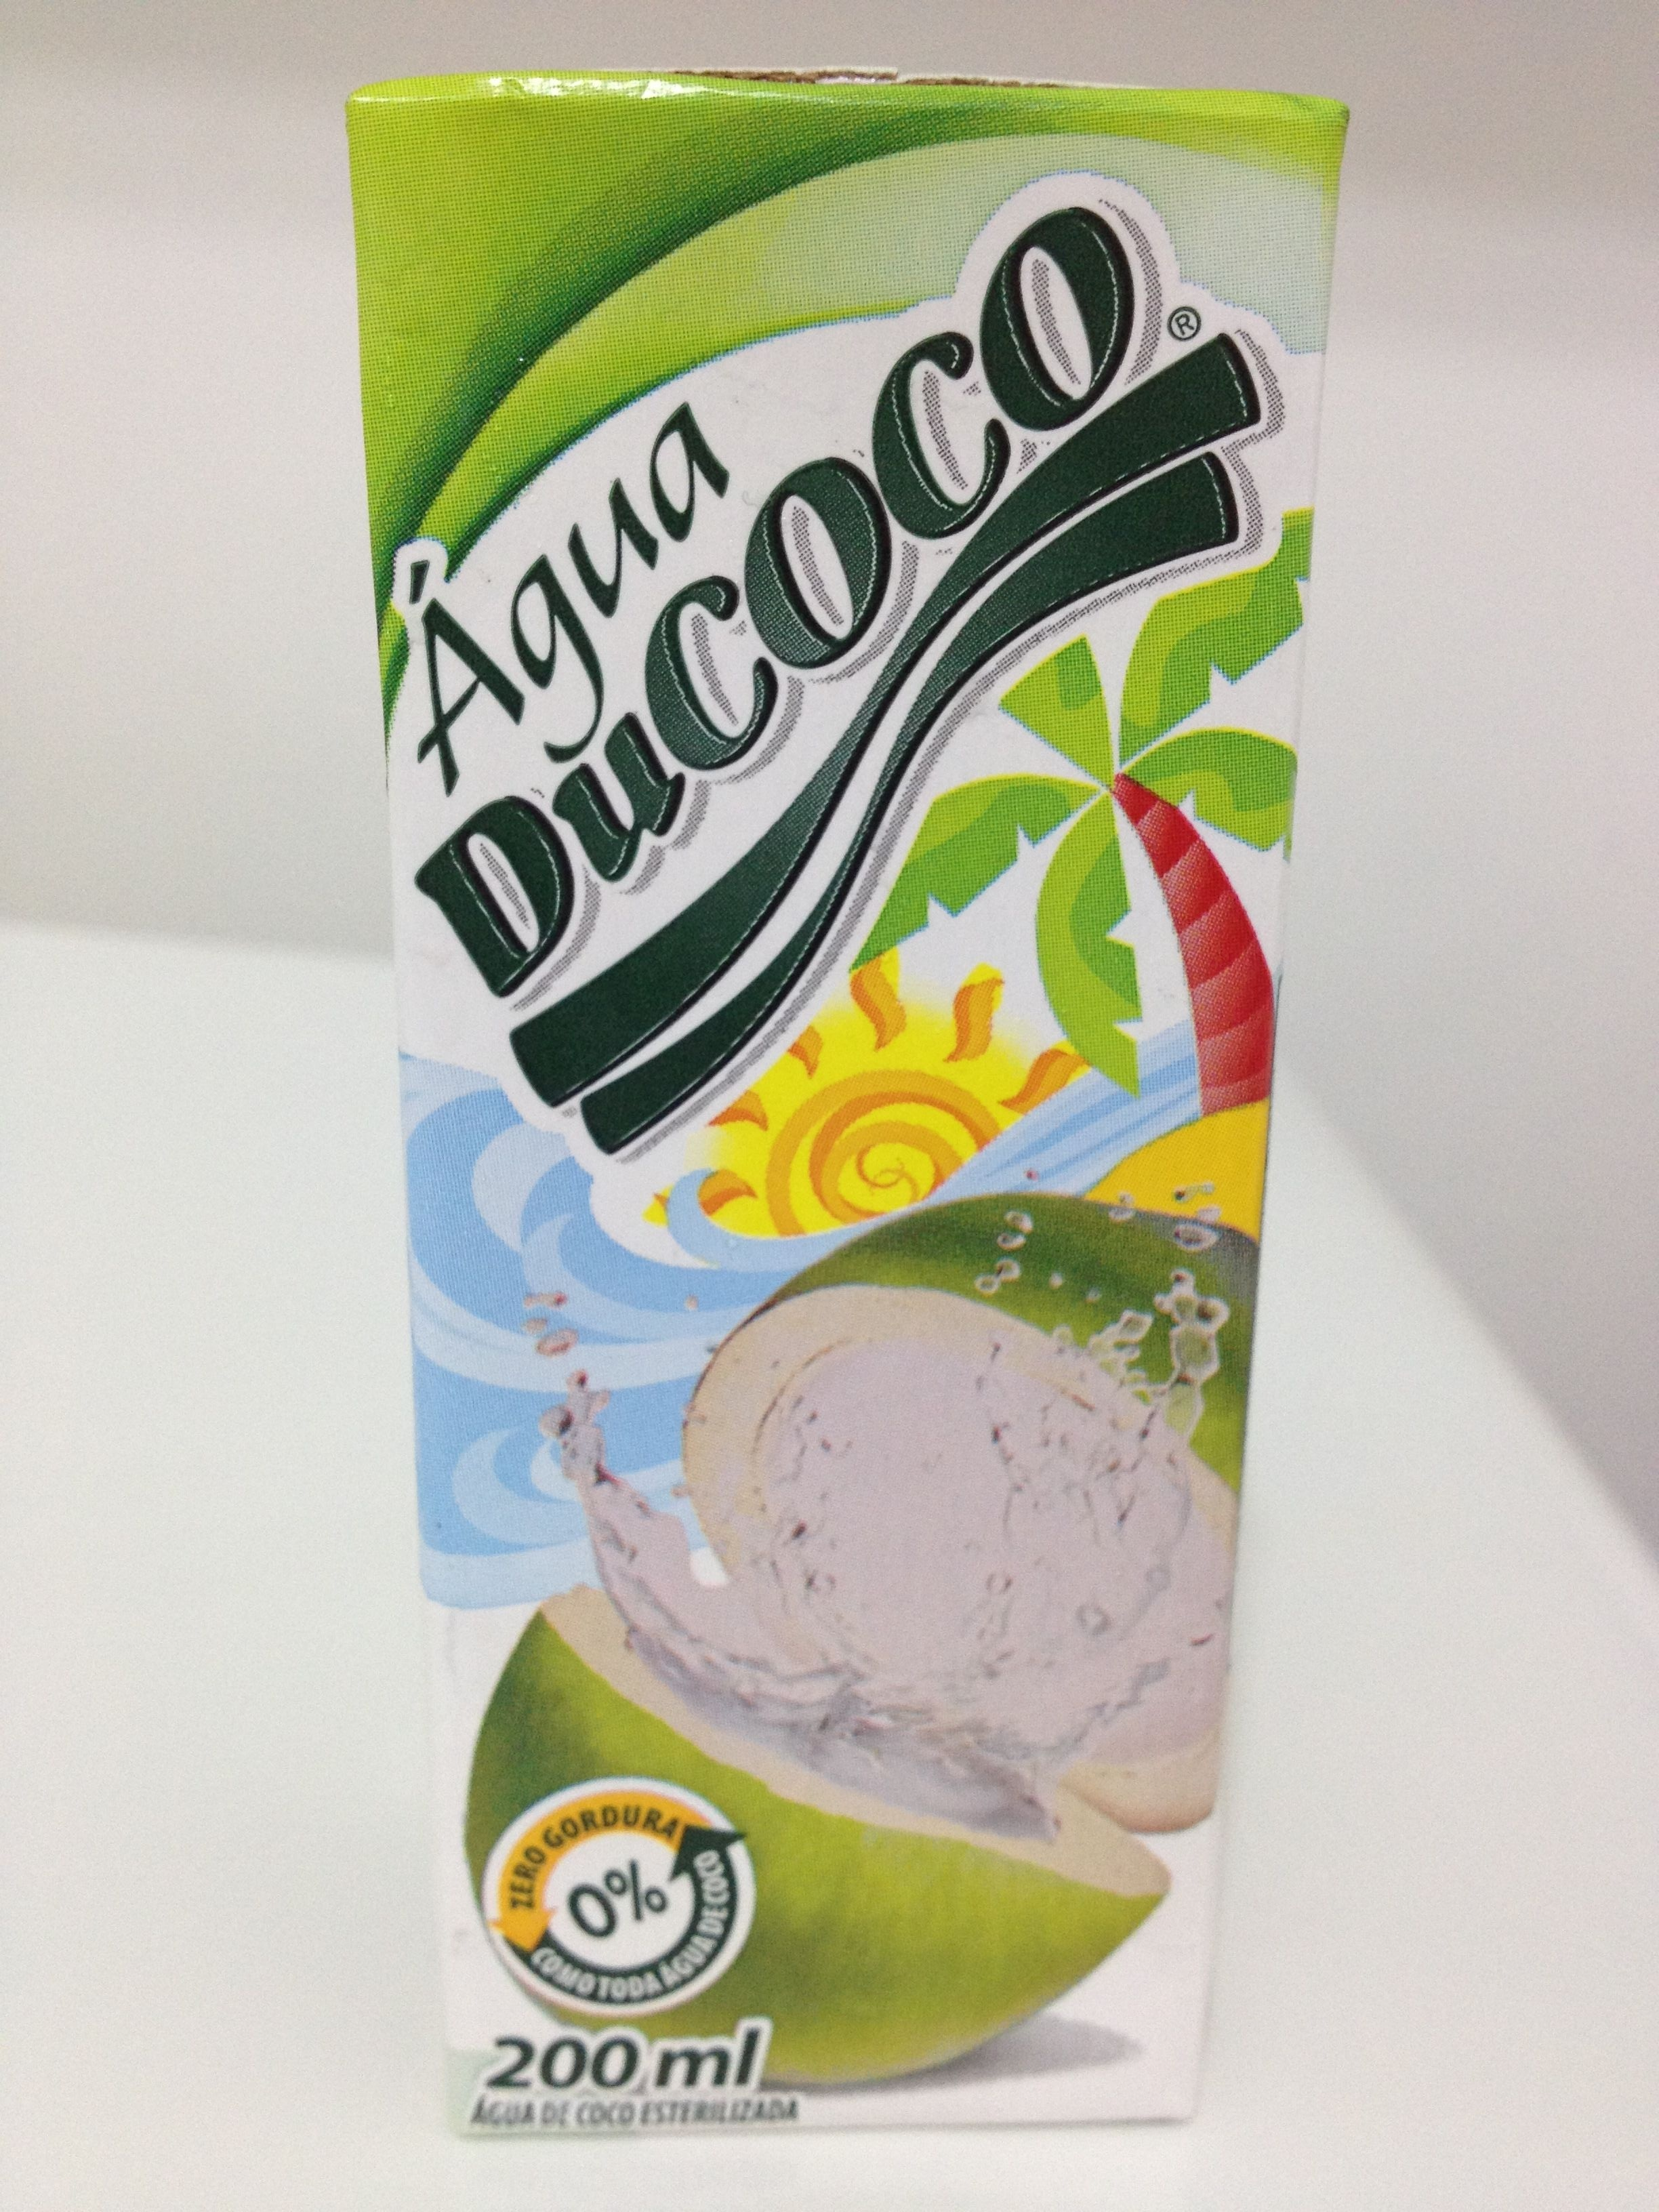 Água de coco - Product - pt